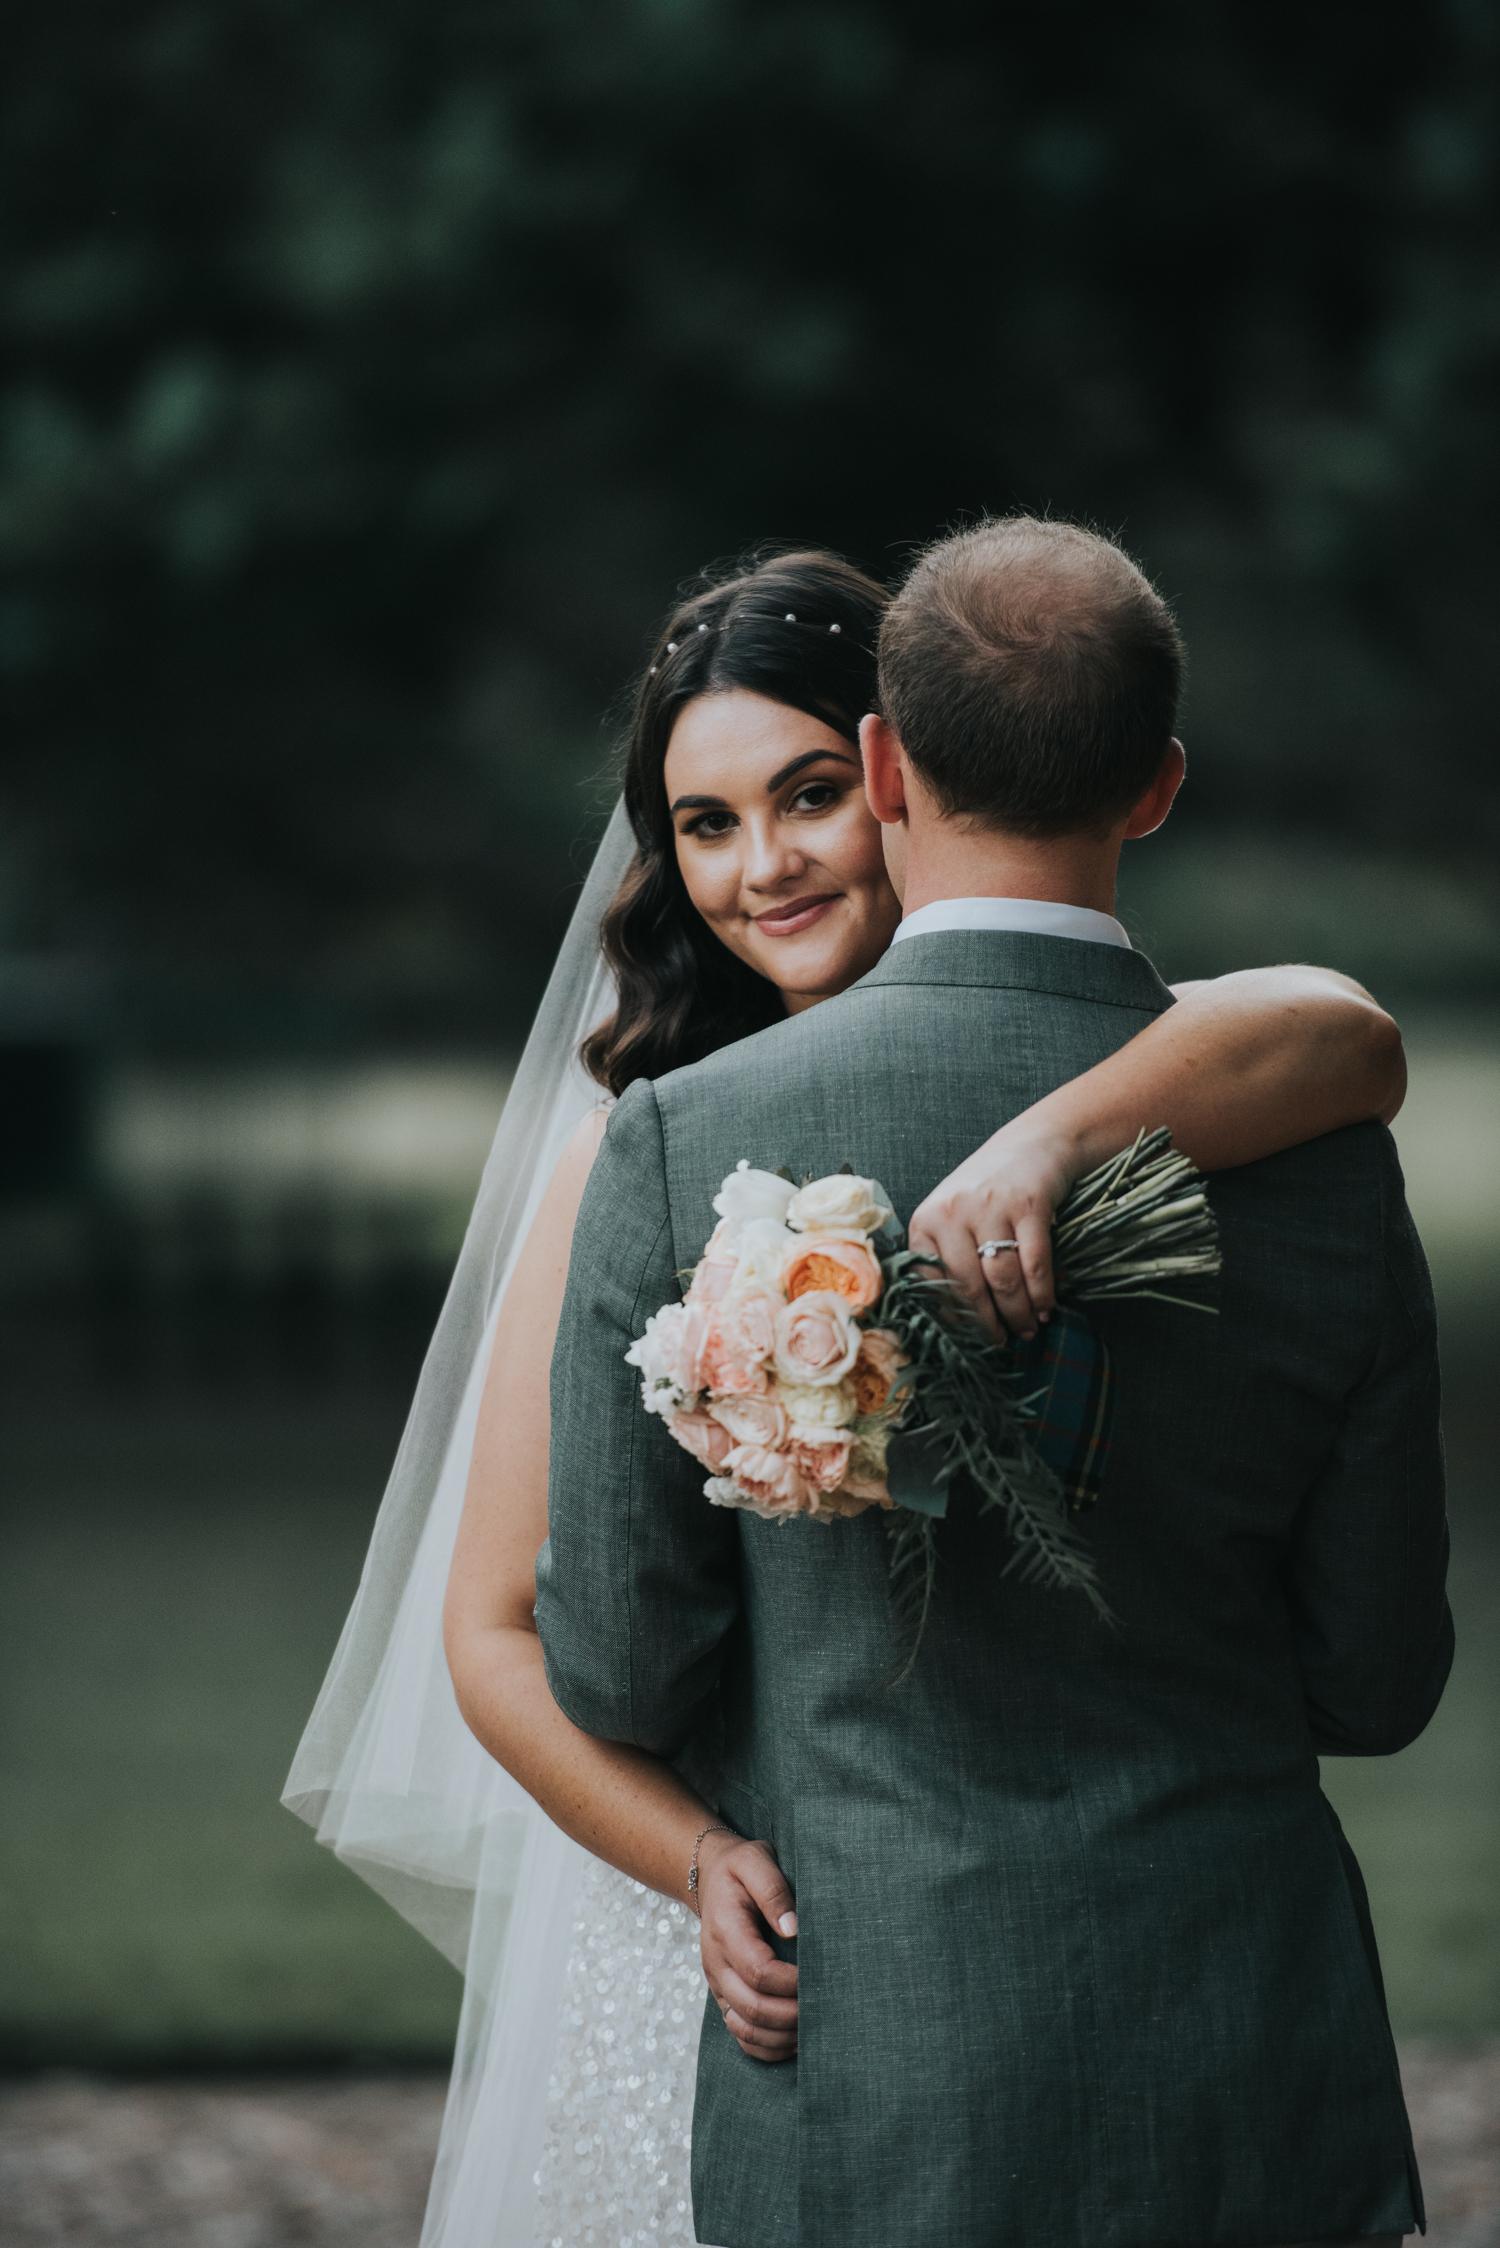 Brisbane Wedding Photographer | Beautiful intimate elopement photography-52.jpg